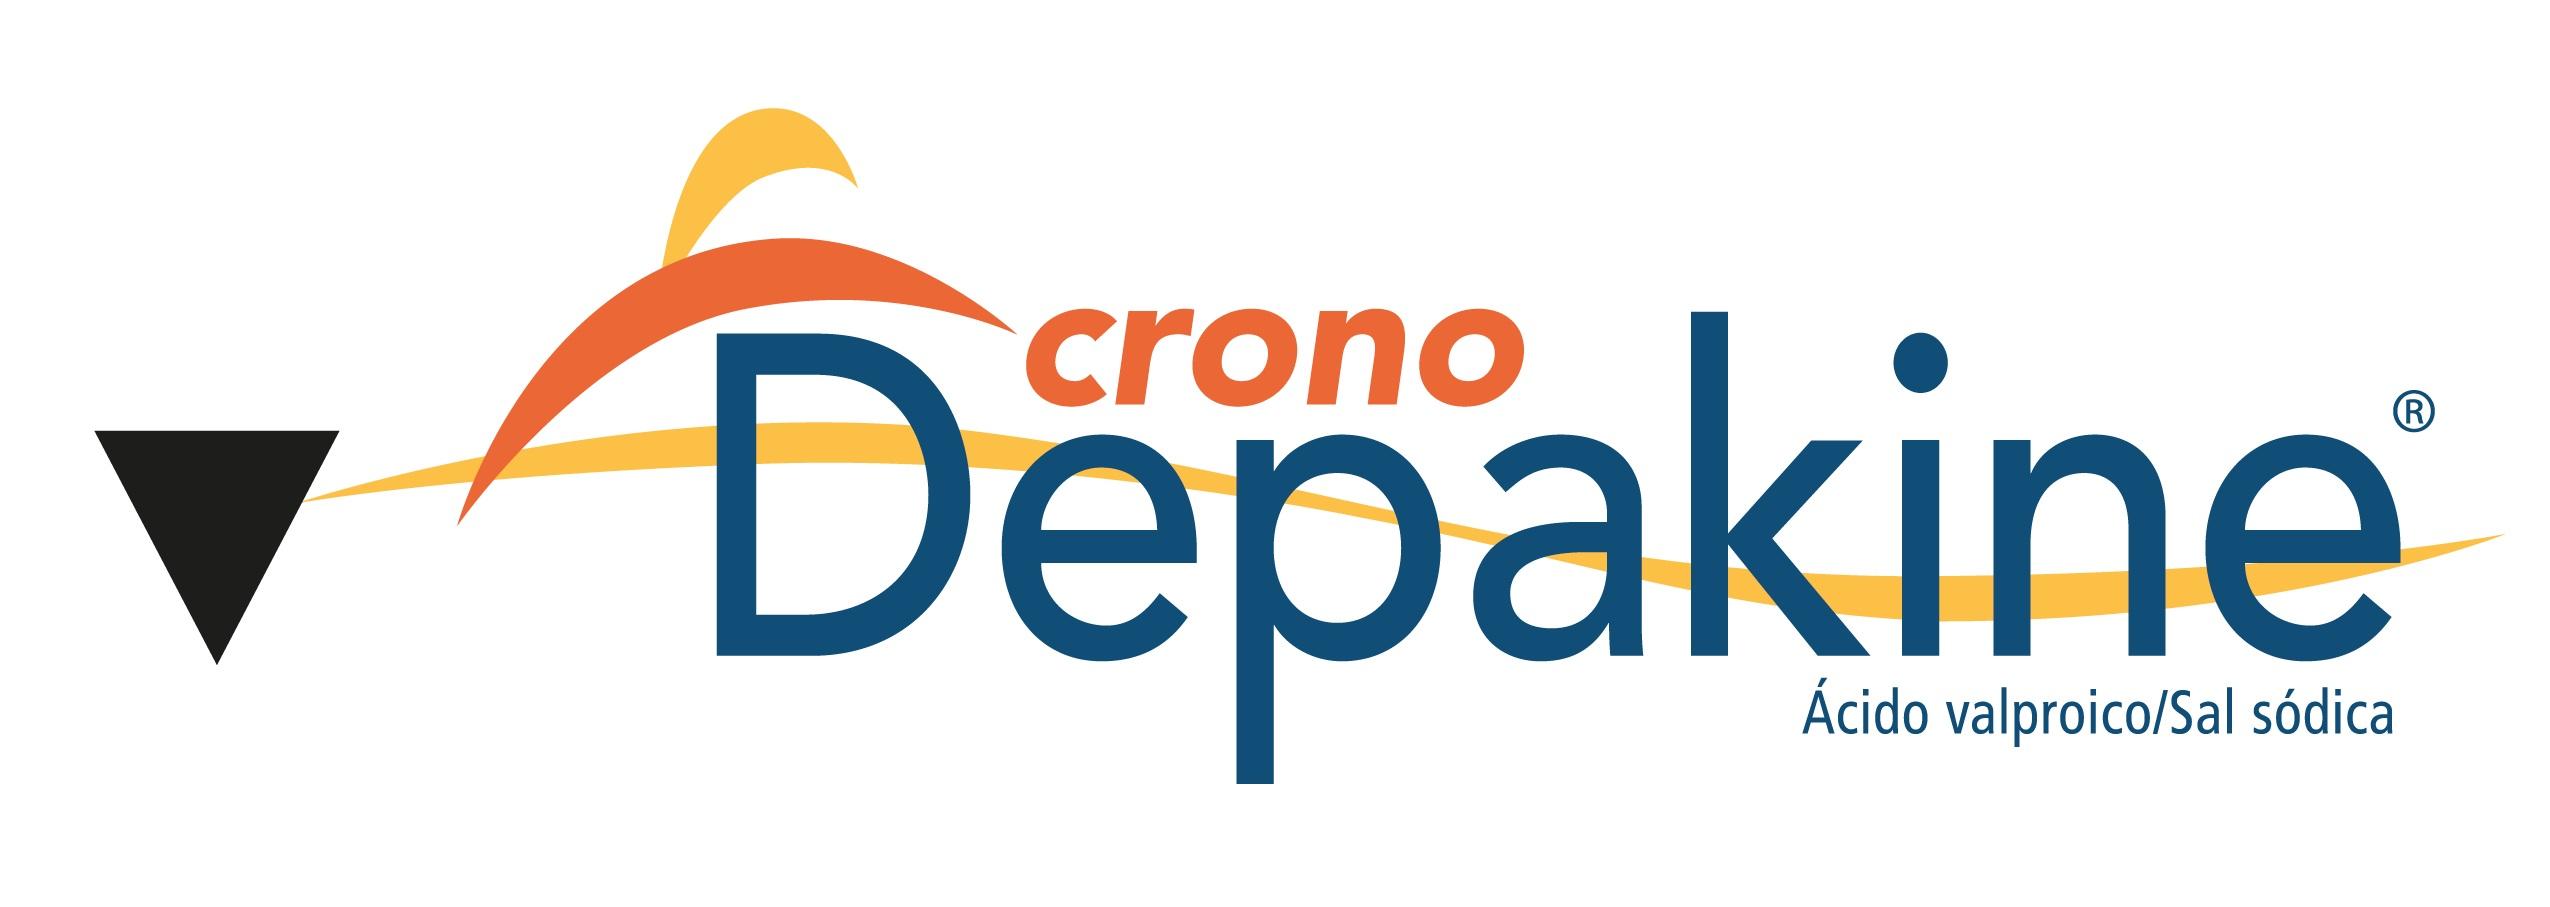 Depakine Crono